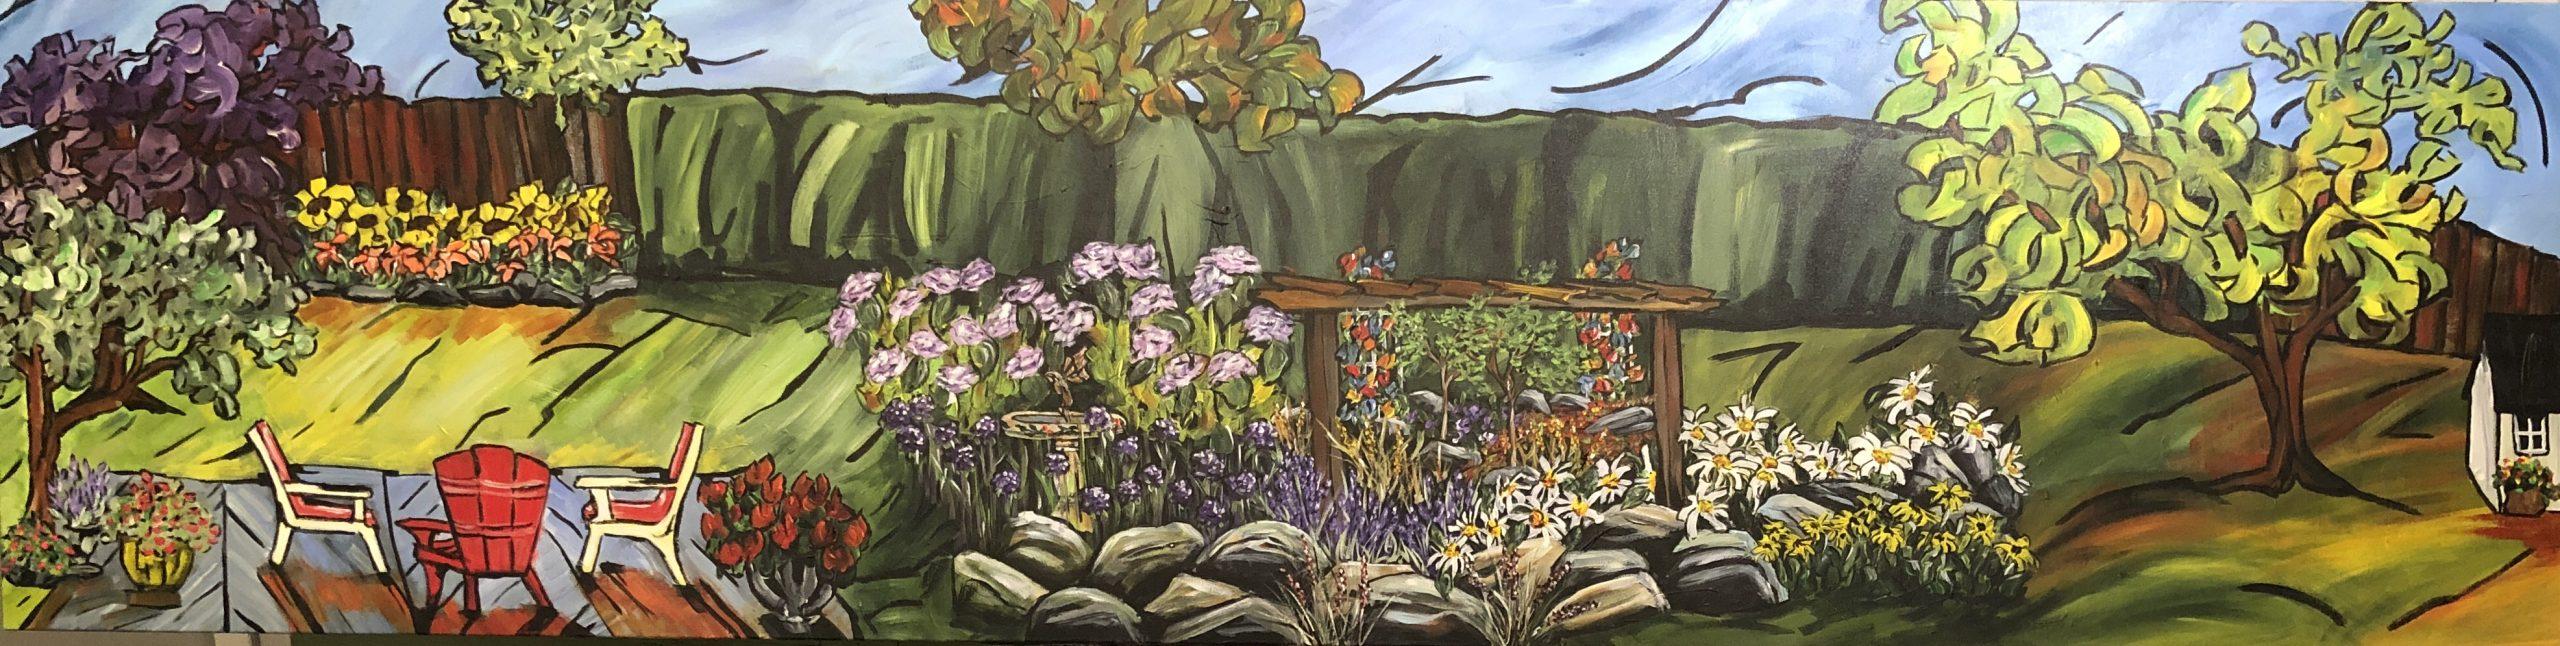 Jan's Garden